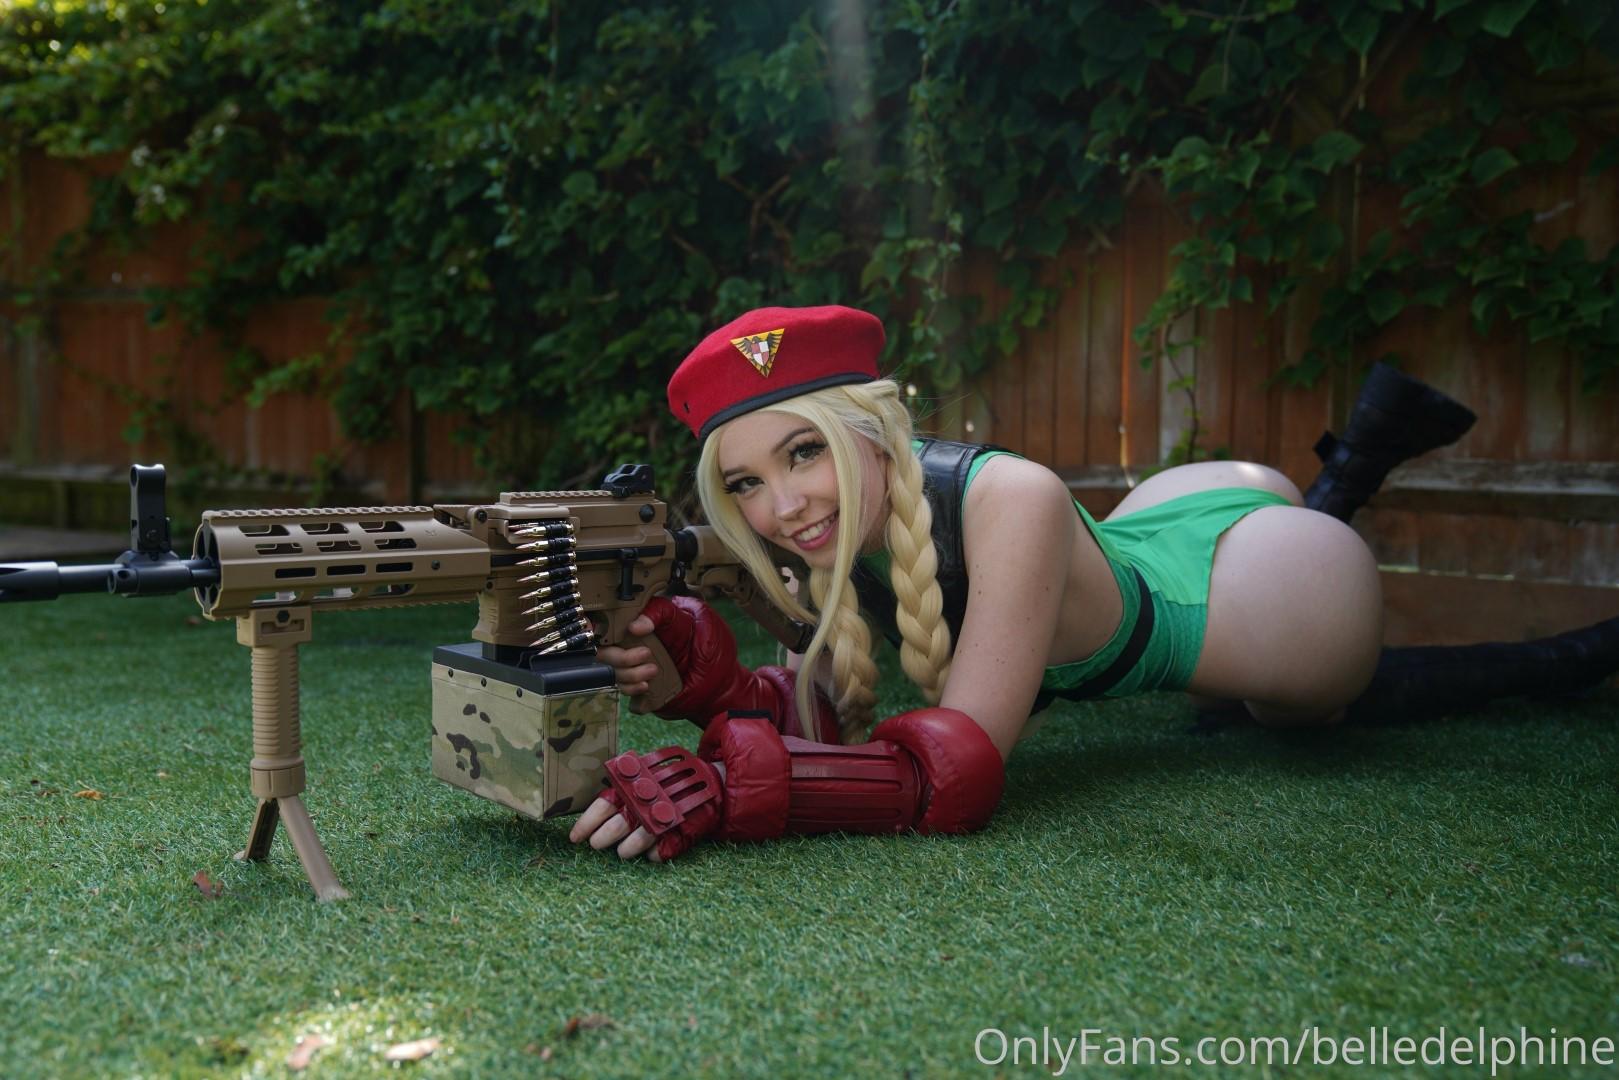 Belle Delphine Cammy Street Fighter Set 0195